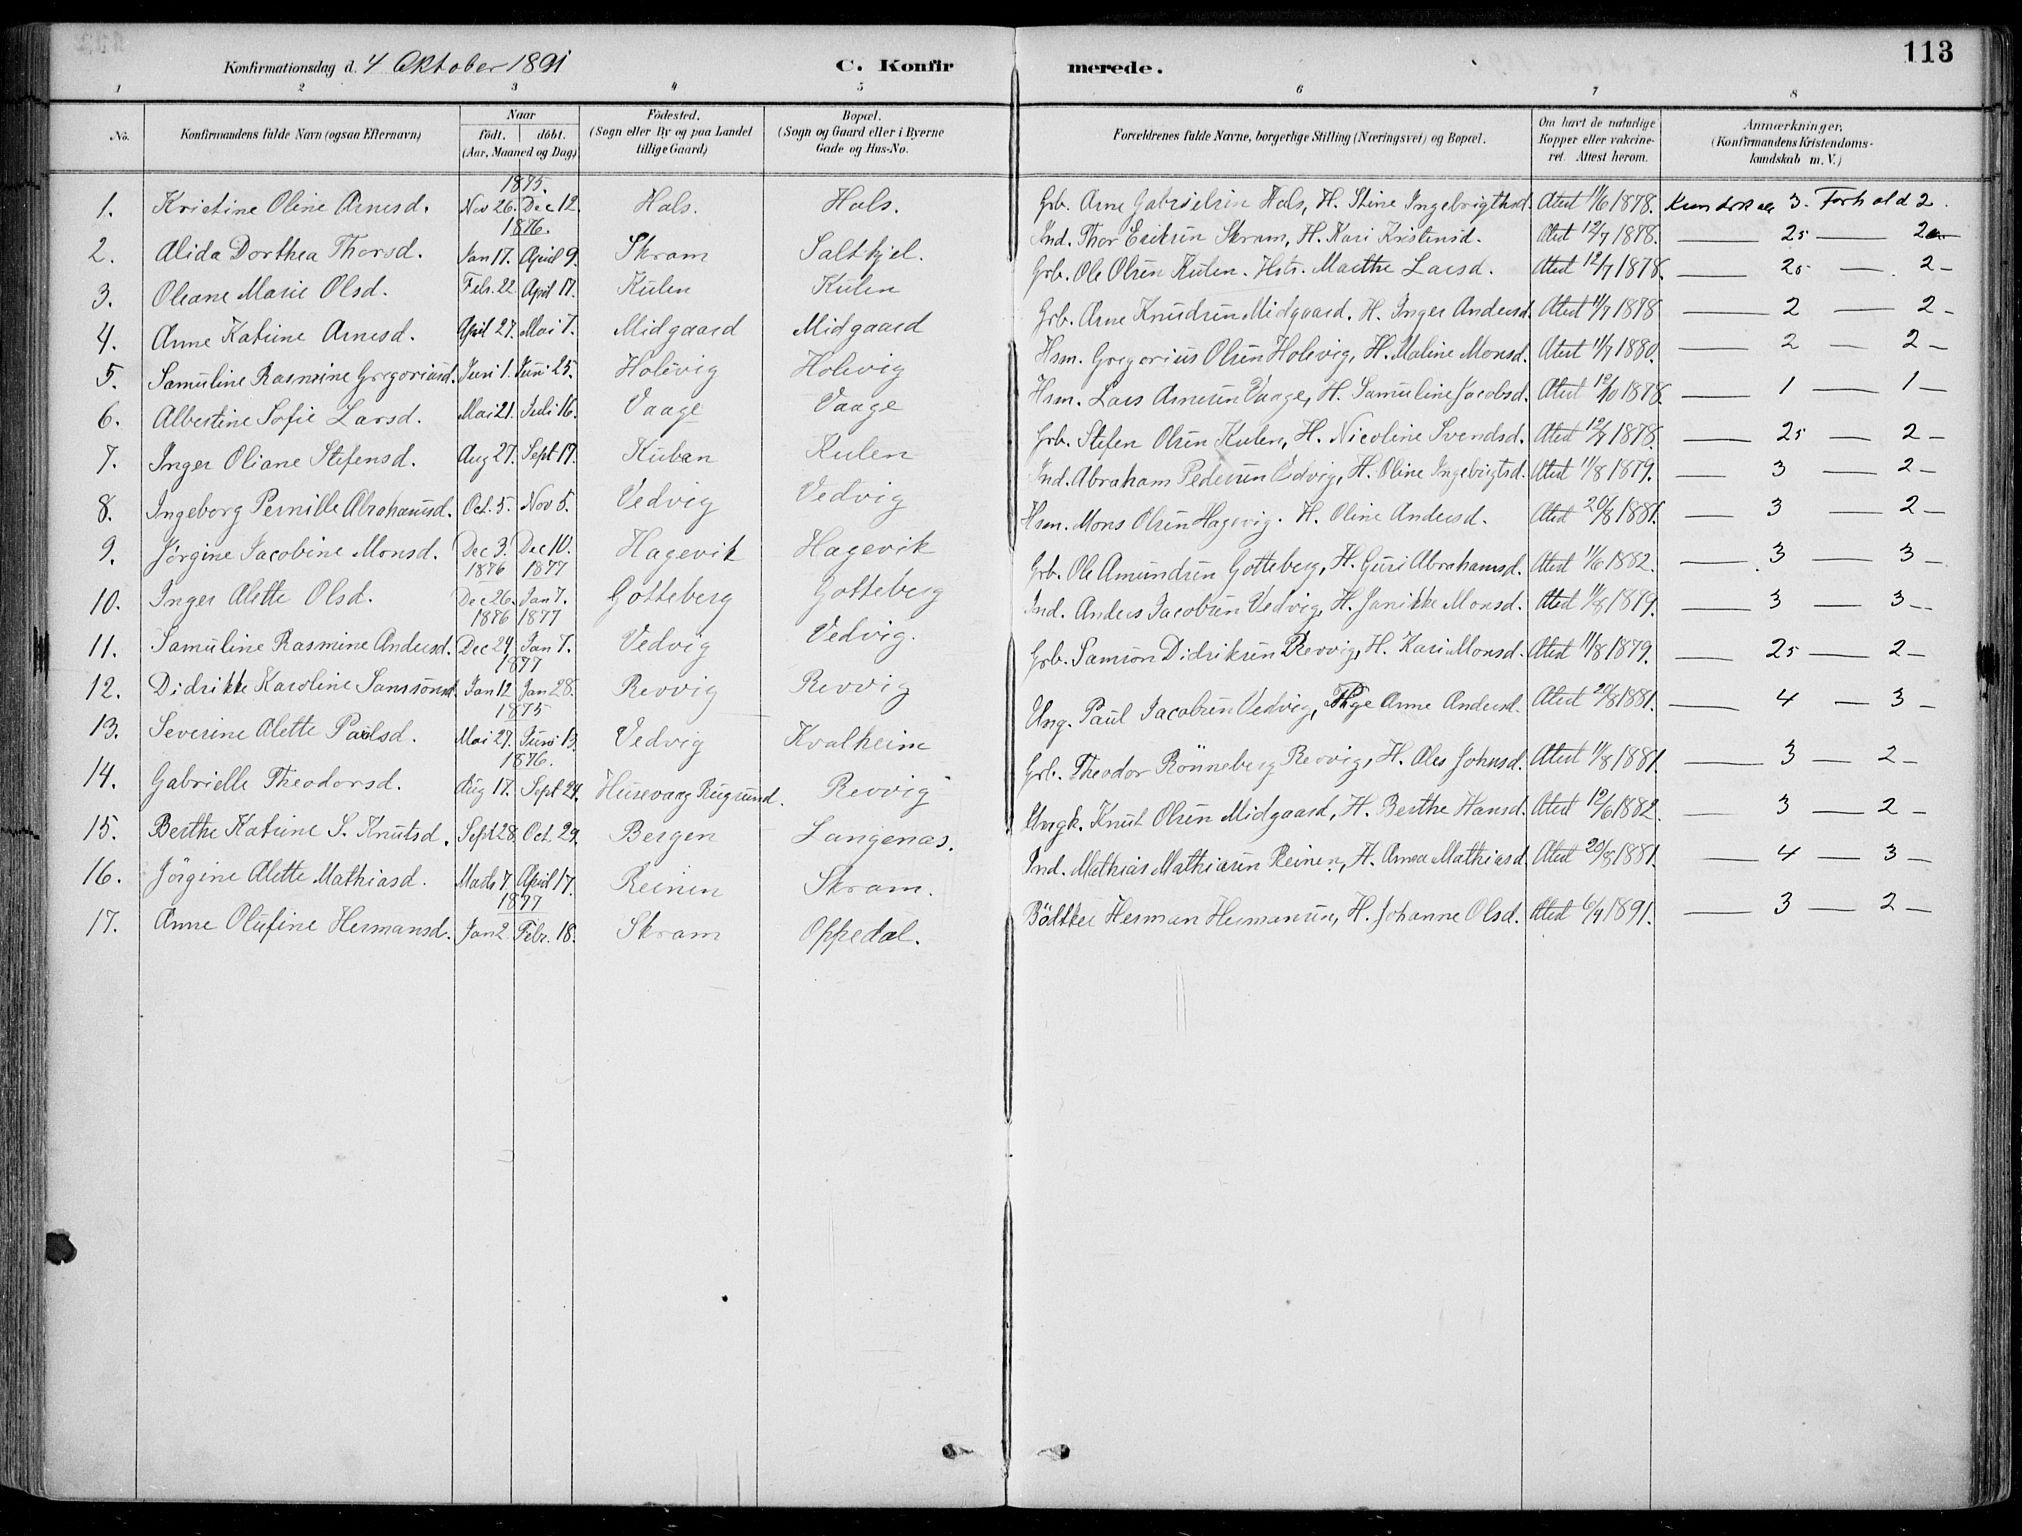 SAB, Selje sokneprestembete*, Ministerialbok nr. C  2, 1889-1904, s. 113